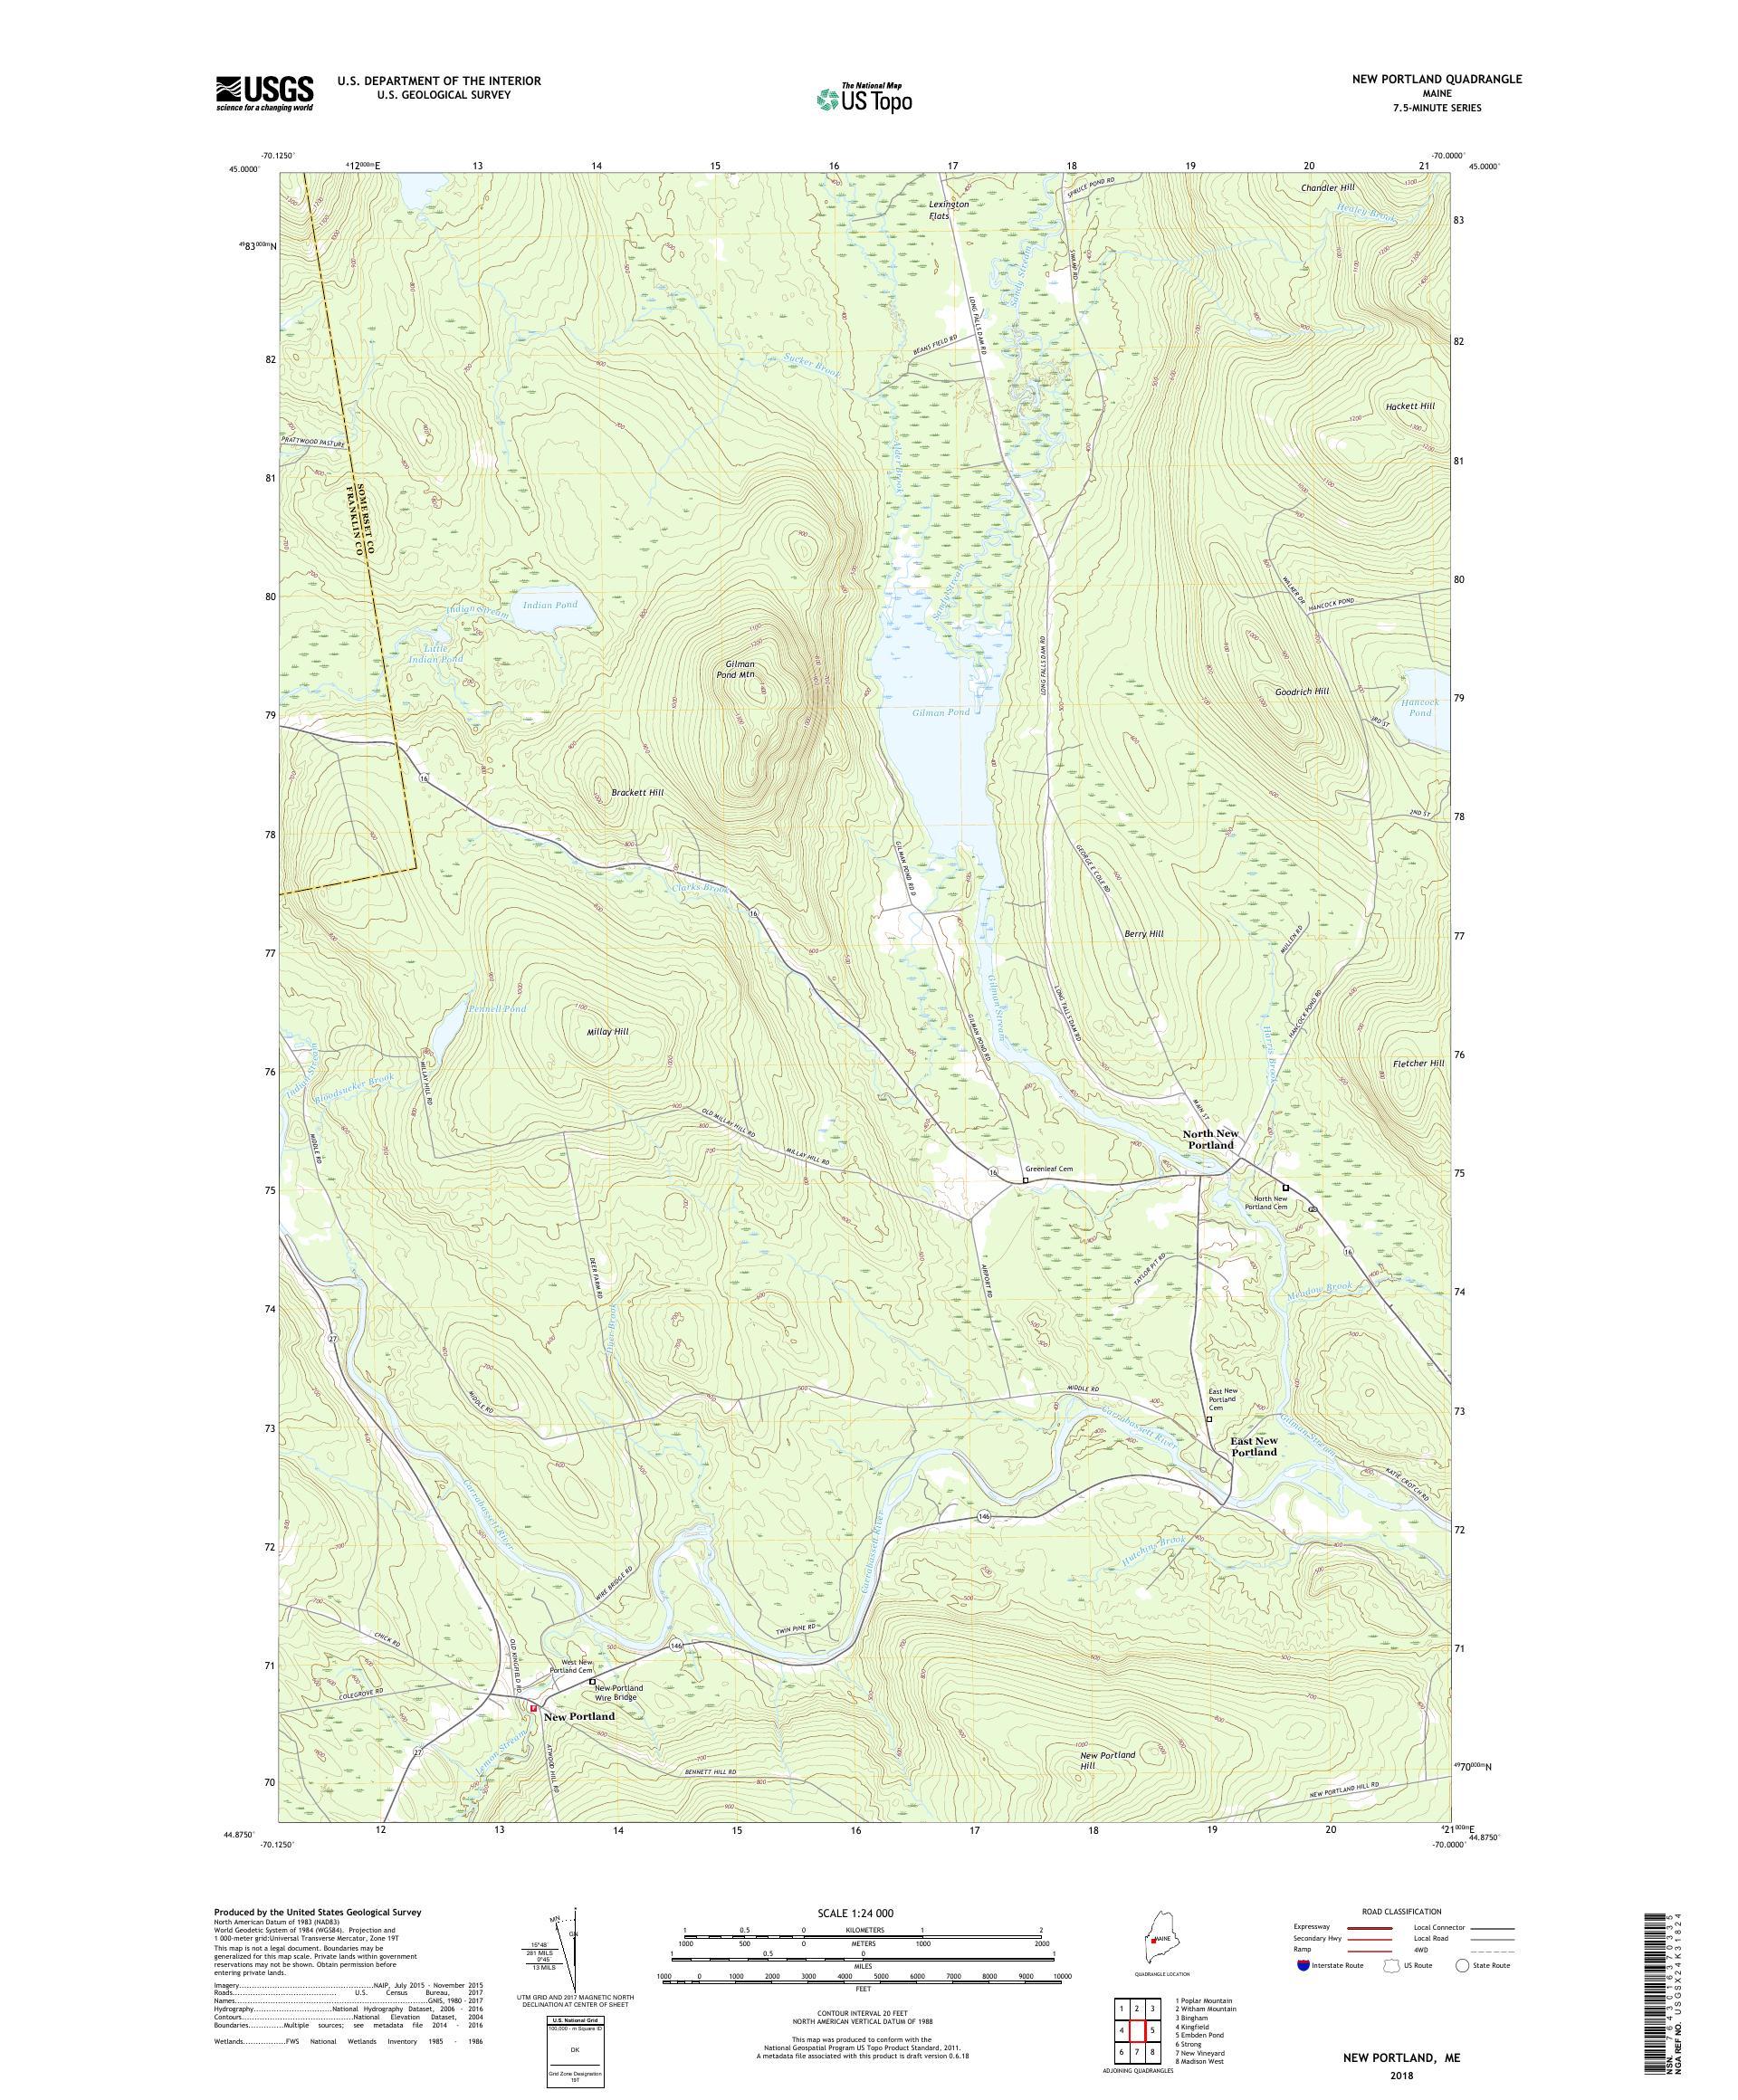 MyTopo New Portland, Maine USGS Quad Topo Map